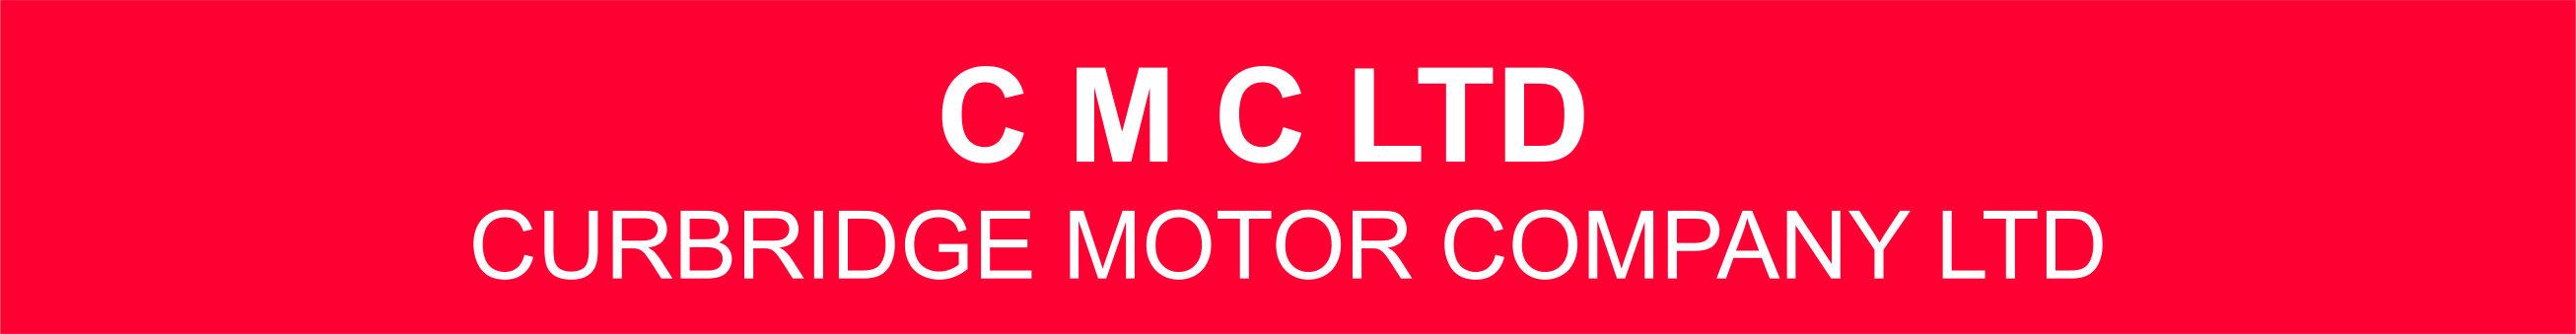 Curbridge Motor Company